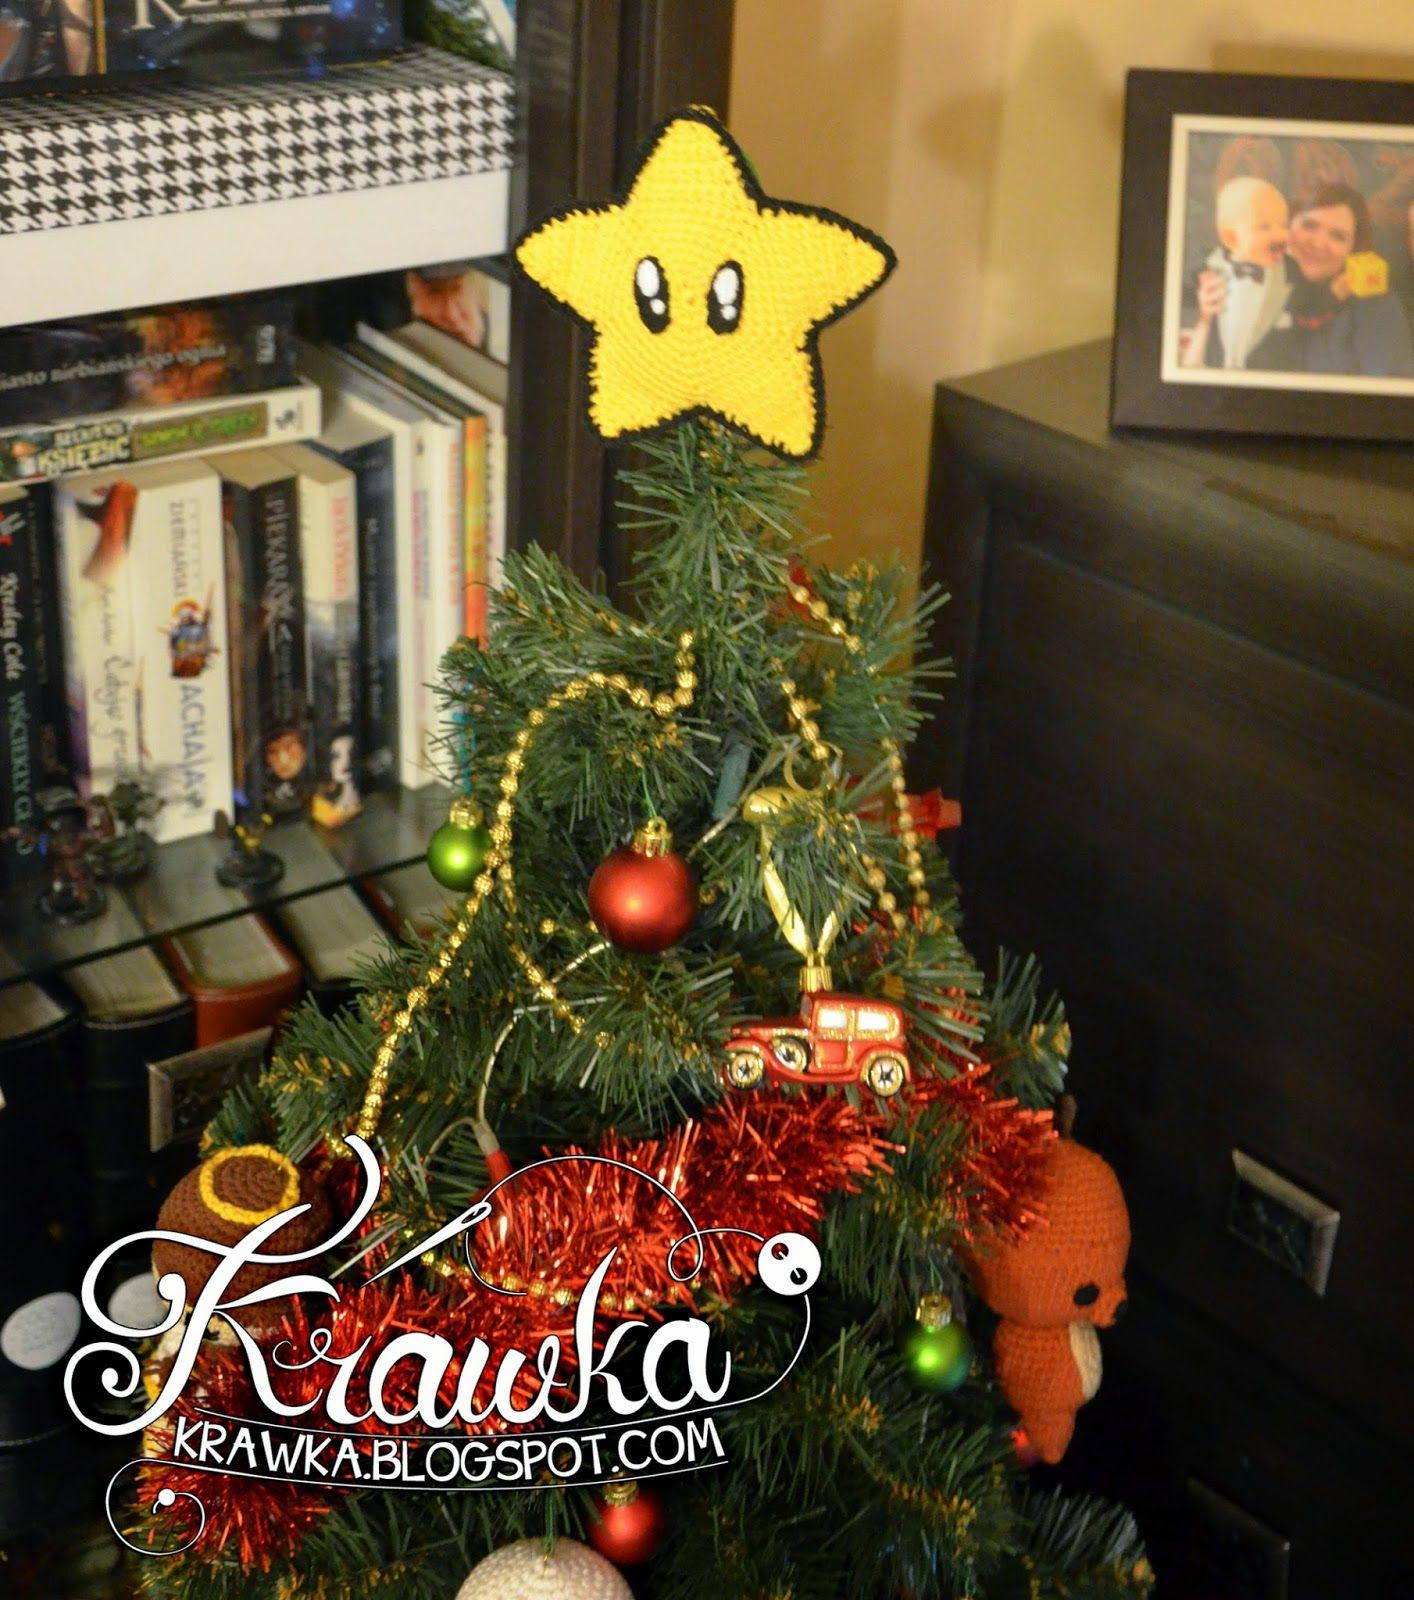 Krawka Crochet Christmas Tree Ornaments Snowman, Reindeer, Angels, Santa And